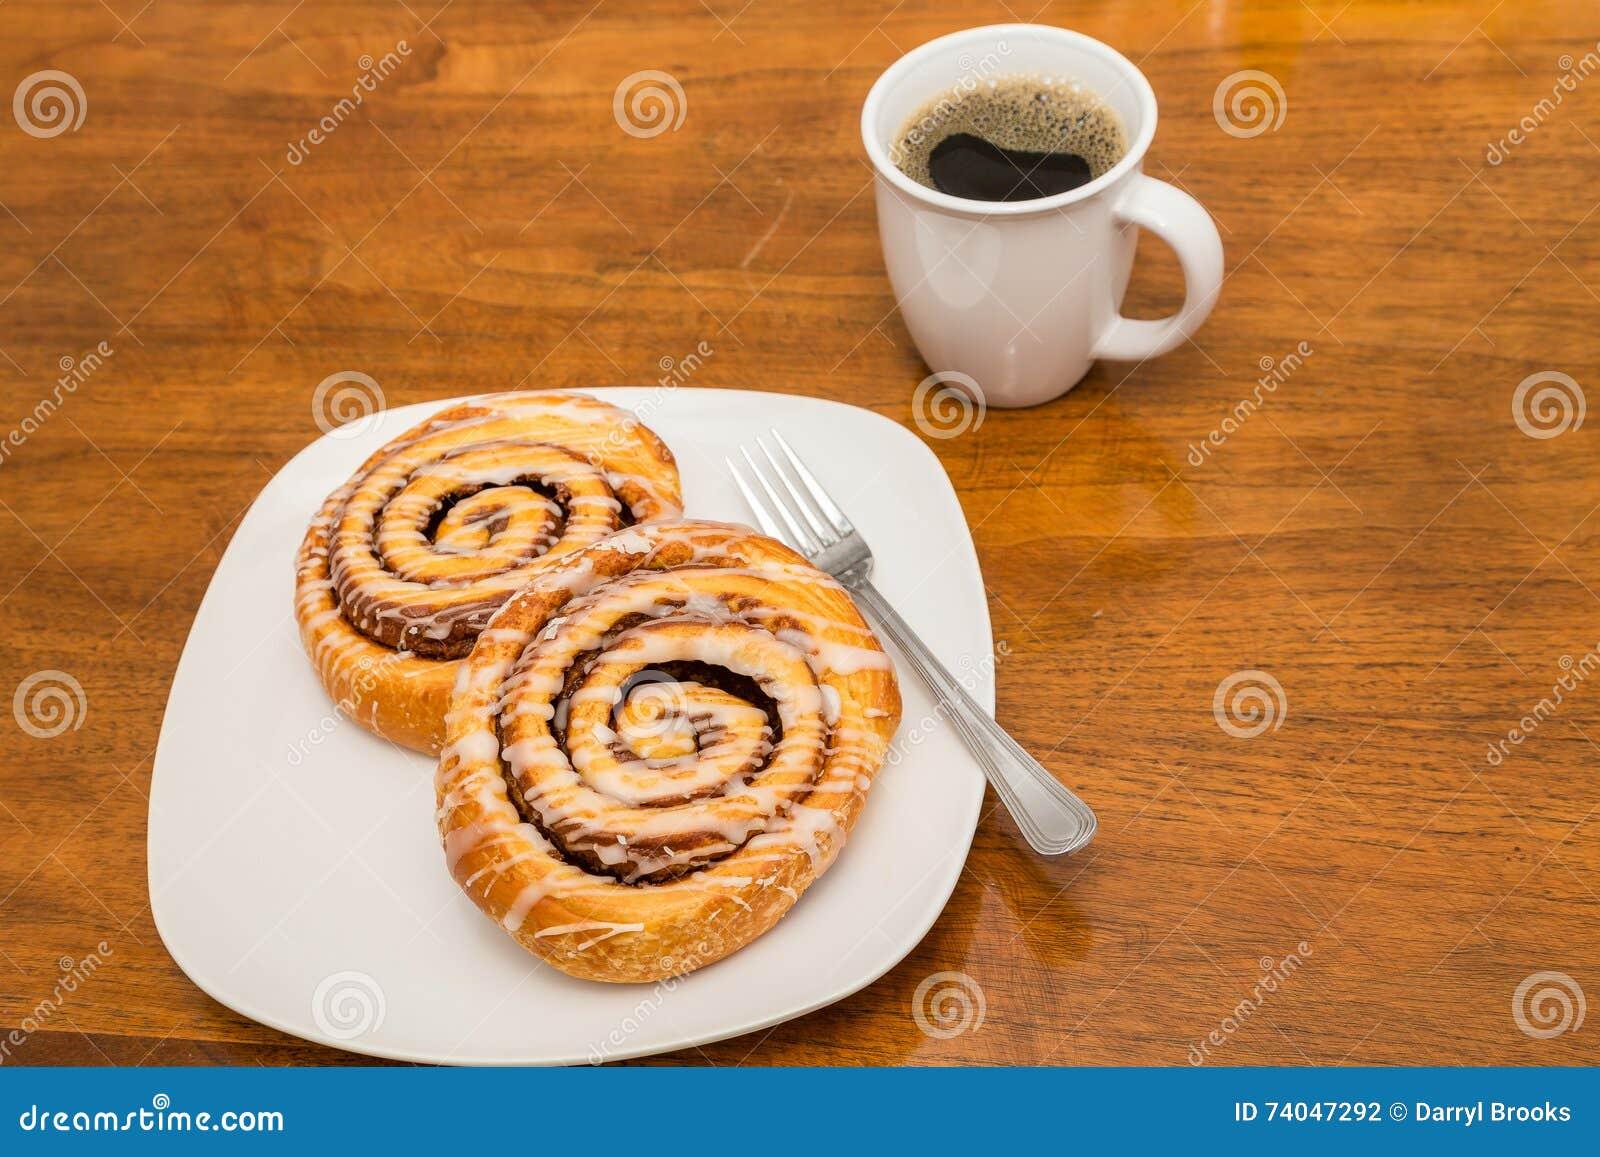 Coffee Cake Using Cinnamon Rolls